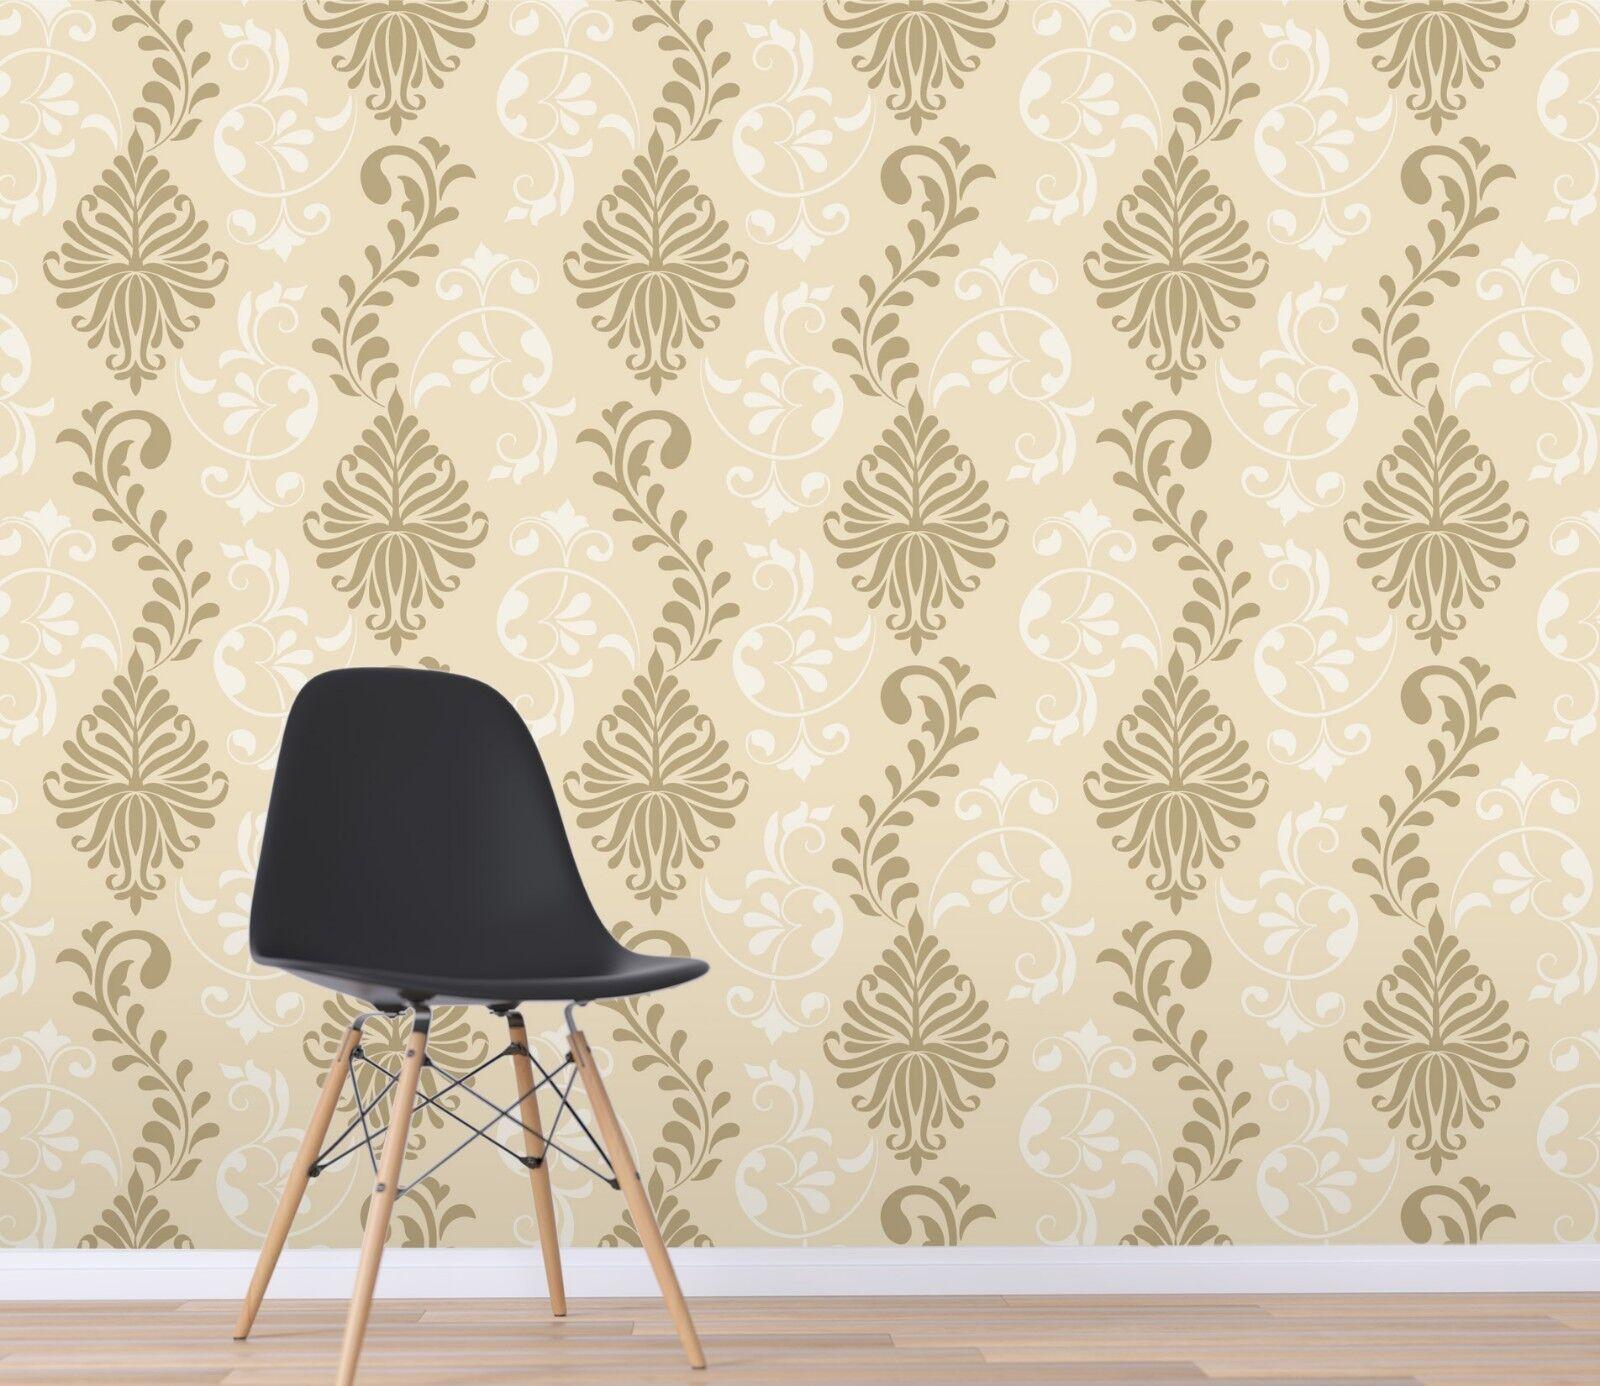 3D Arabesque 24 Wallpaper Mural Print Wall Indoor Wallpaper Murals UK Lemon